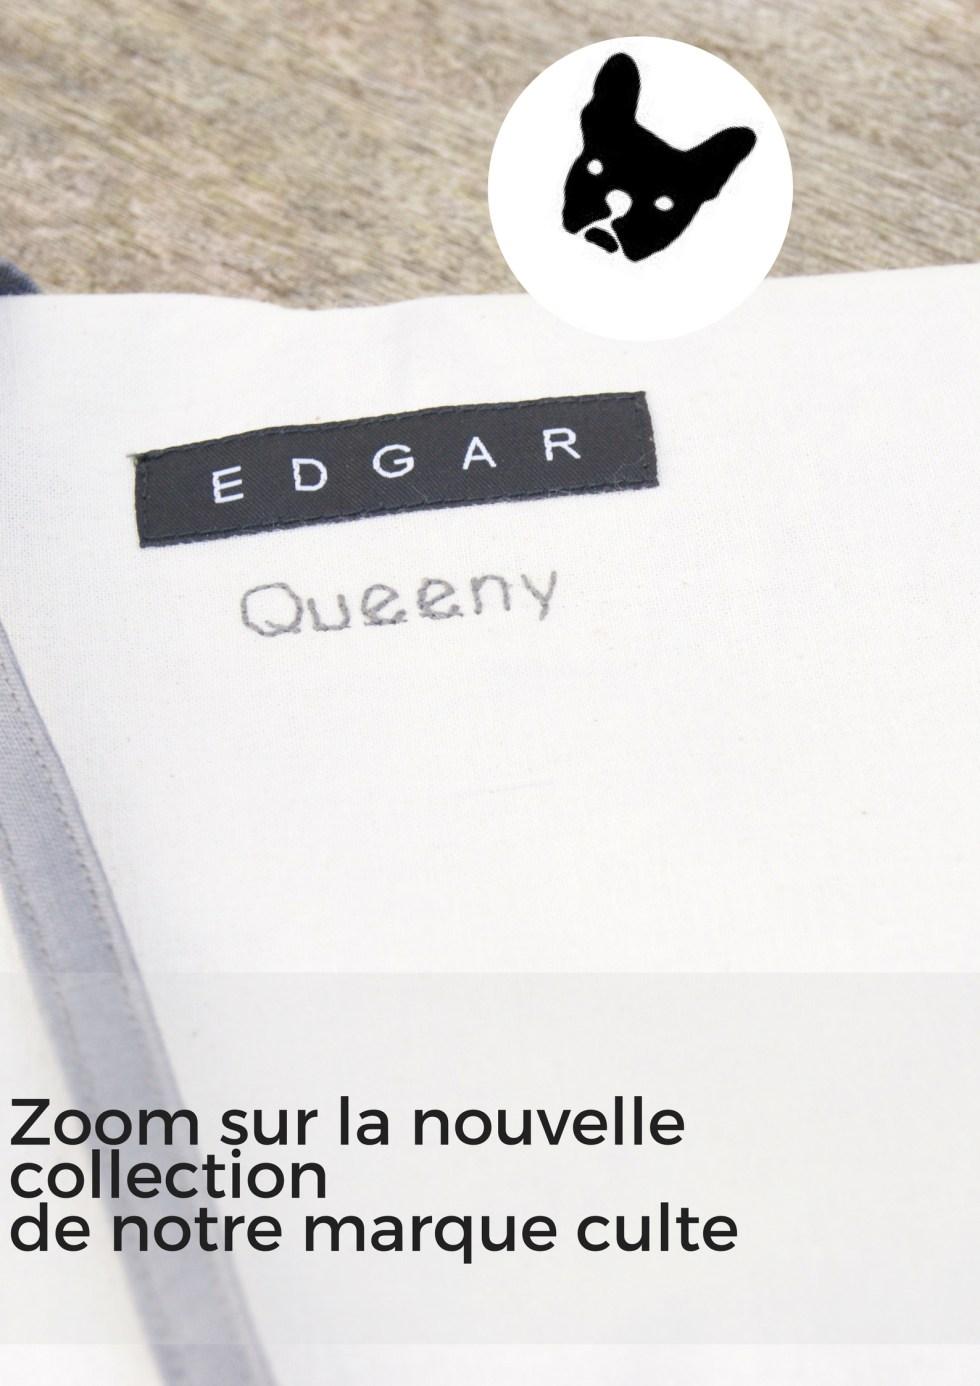 edgar (4)